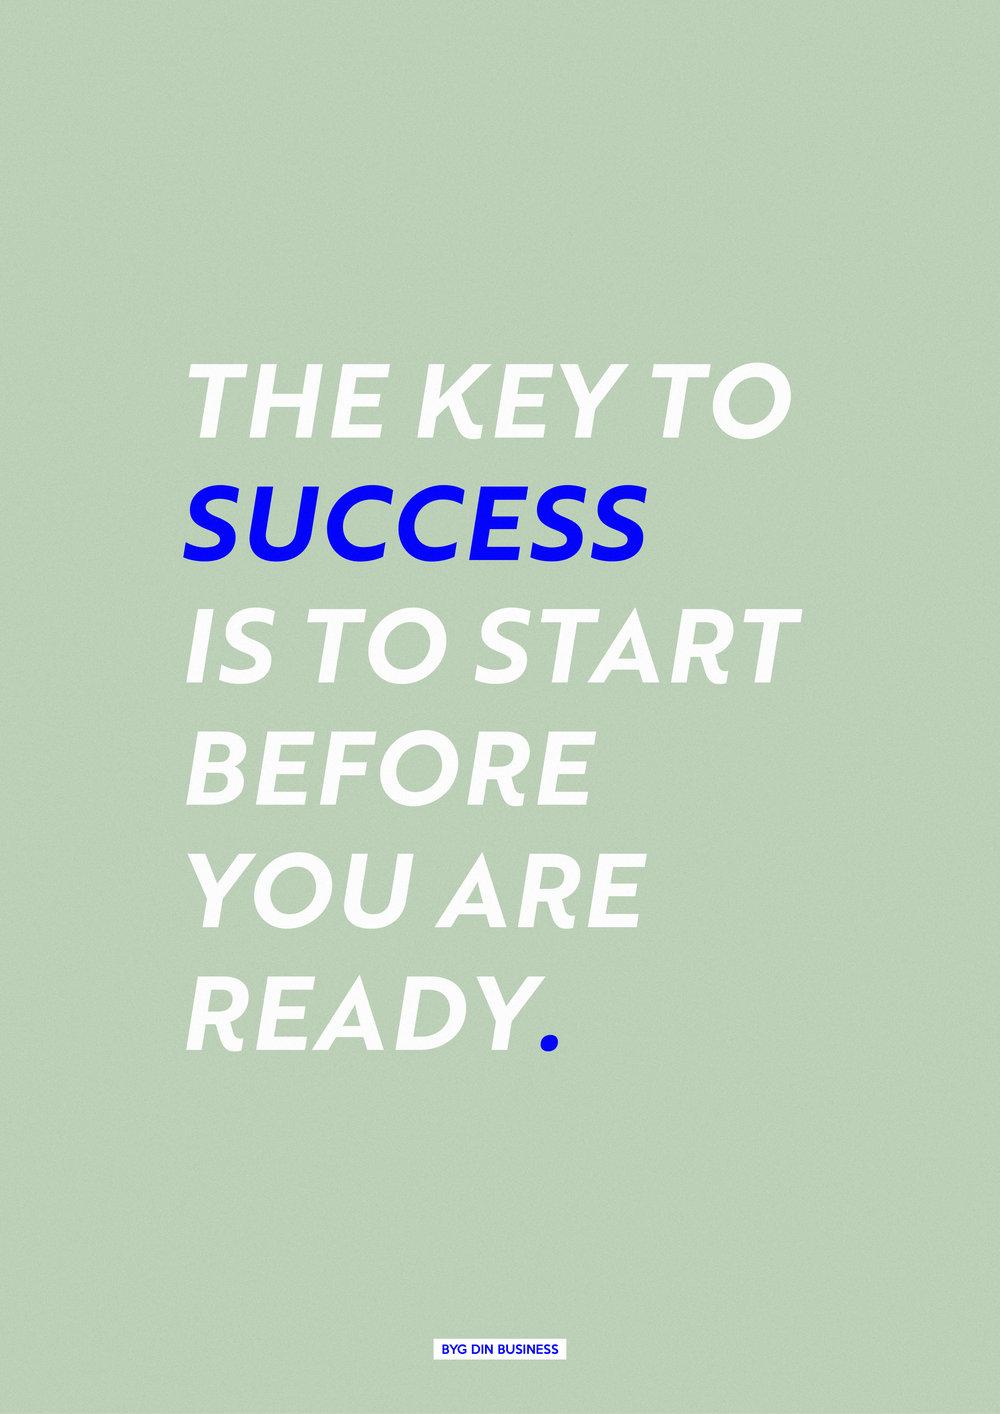 The Key To Success, plakat.jpg